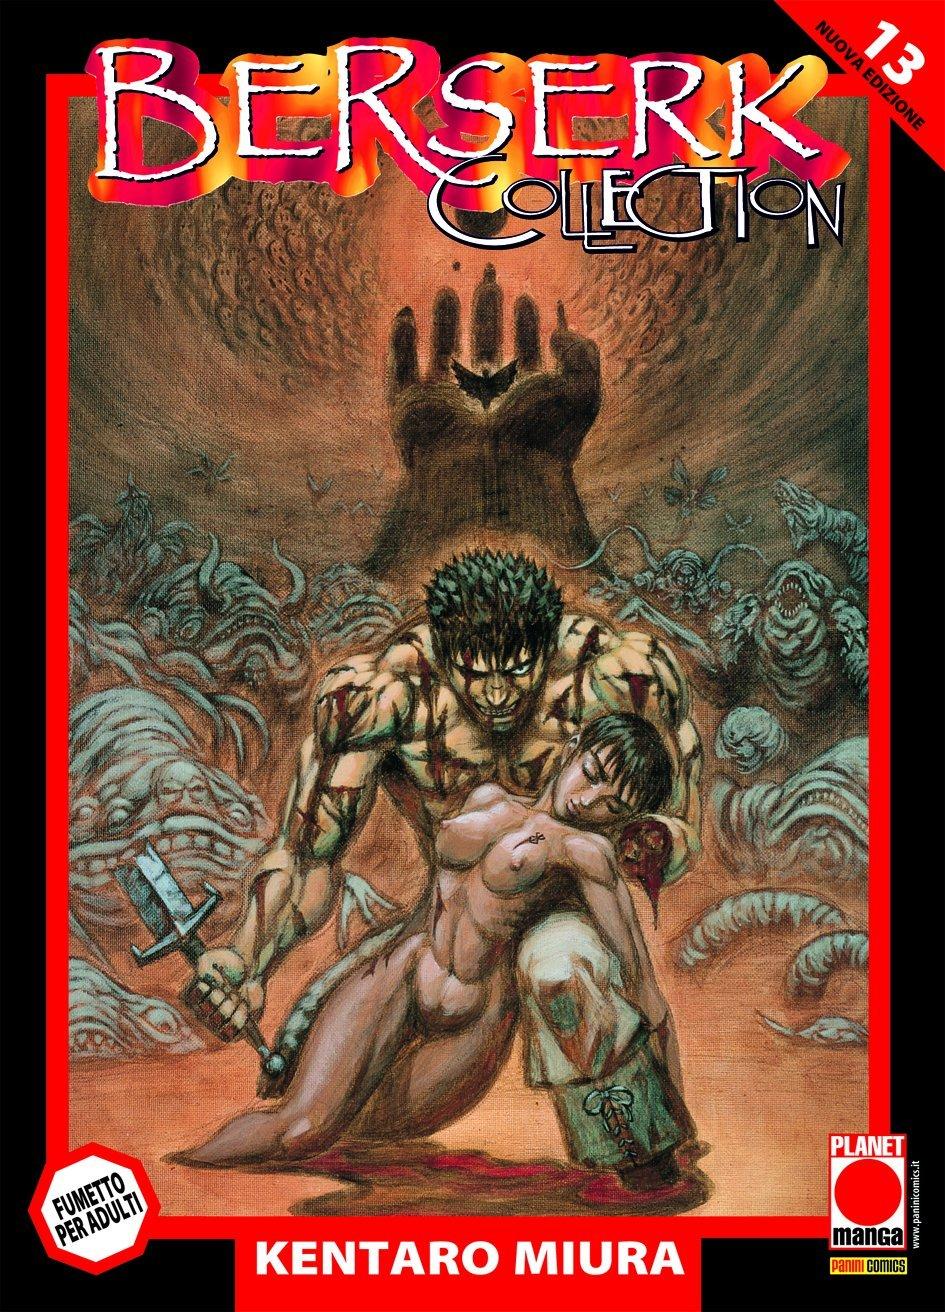 Berserk Collection Serie Nera vol. 13